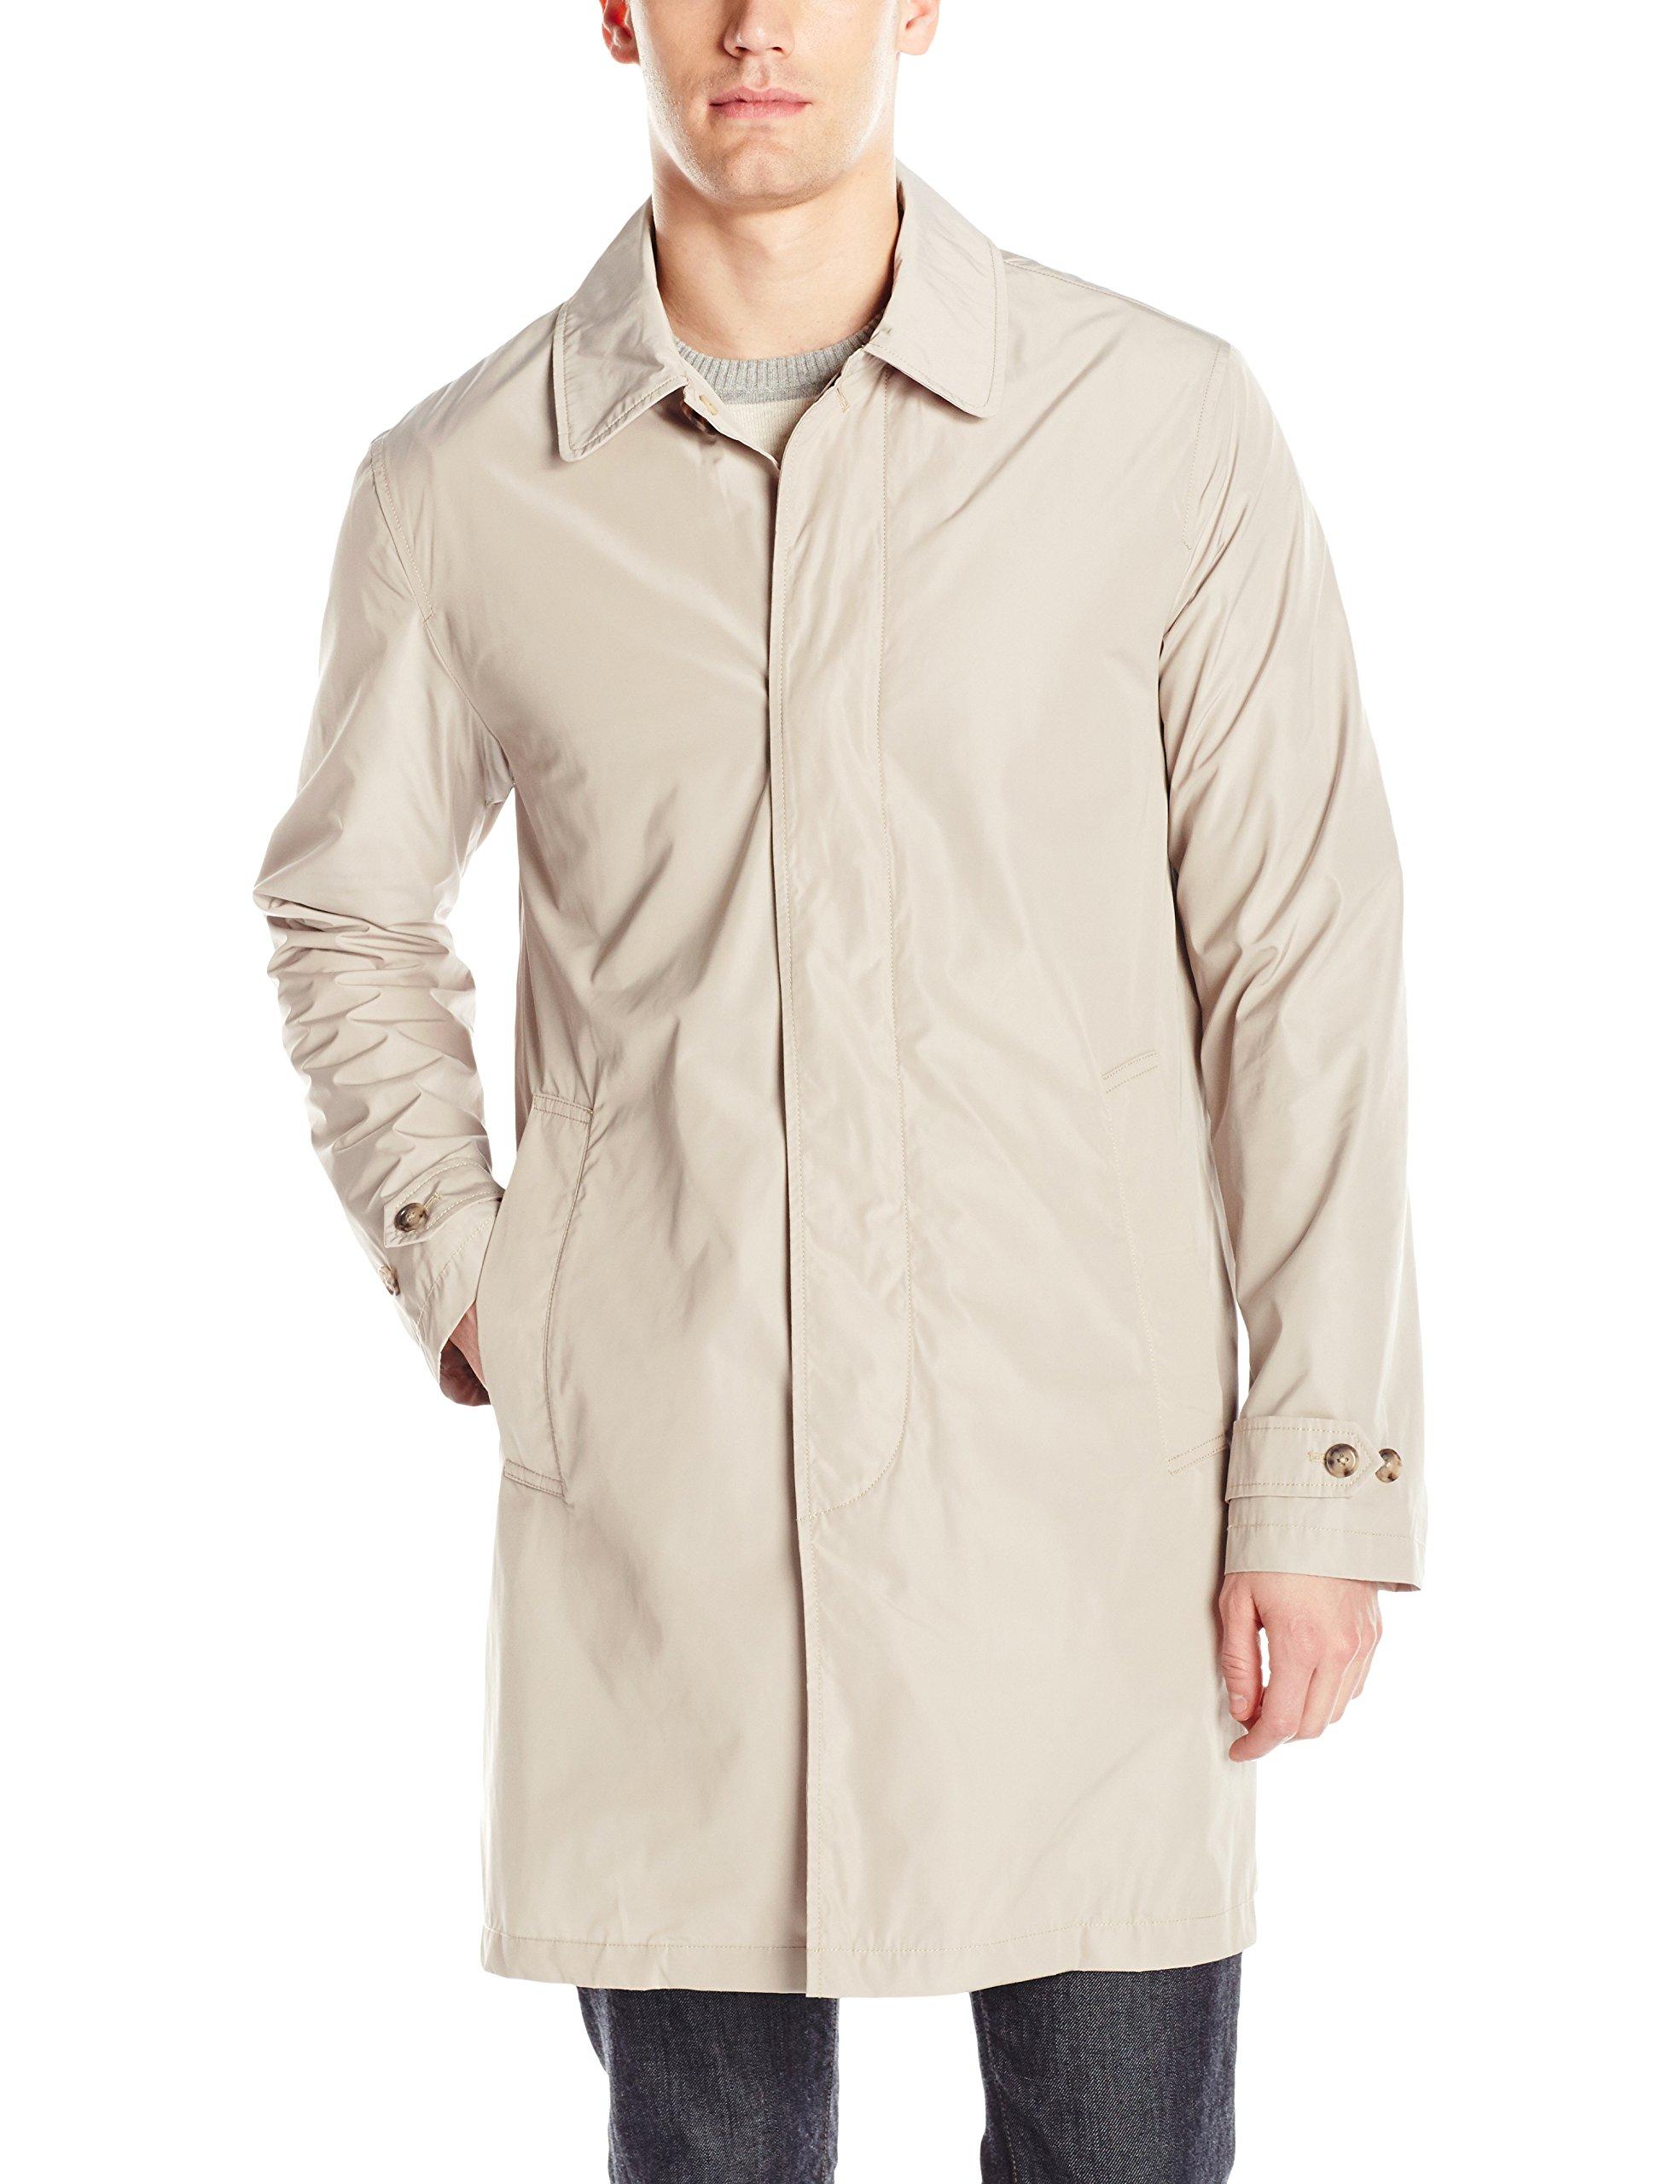 Jack Spade Men's Packable Trench Coat, Light Khaki, Large